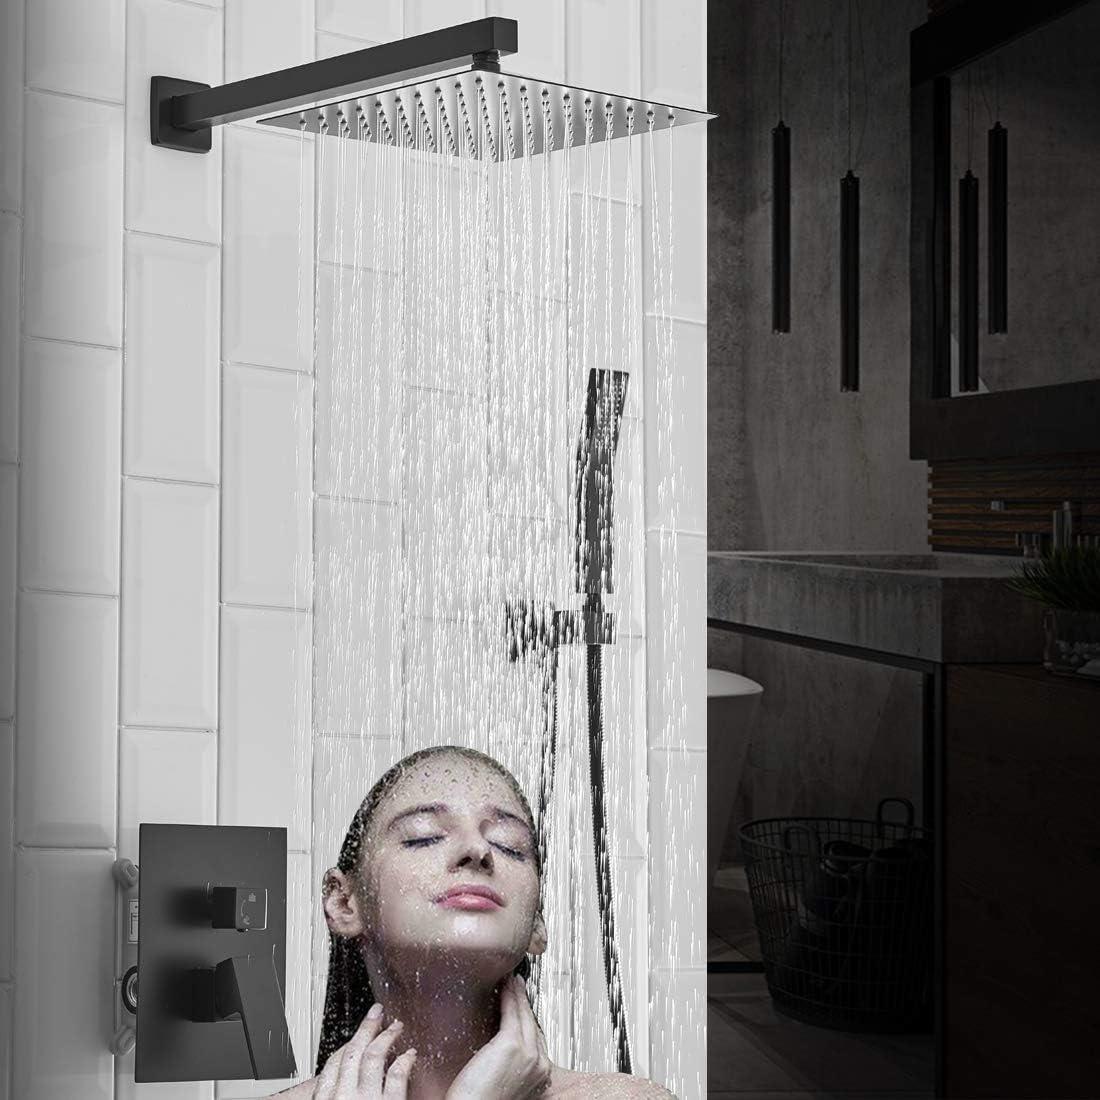 20 Inch Rain Shower System Matte Black Bathroom Shower Faucet Set Complete  Bathtub Shower Combo Matte Black Luxury Shower Fixtures Pressure Balance ...